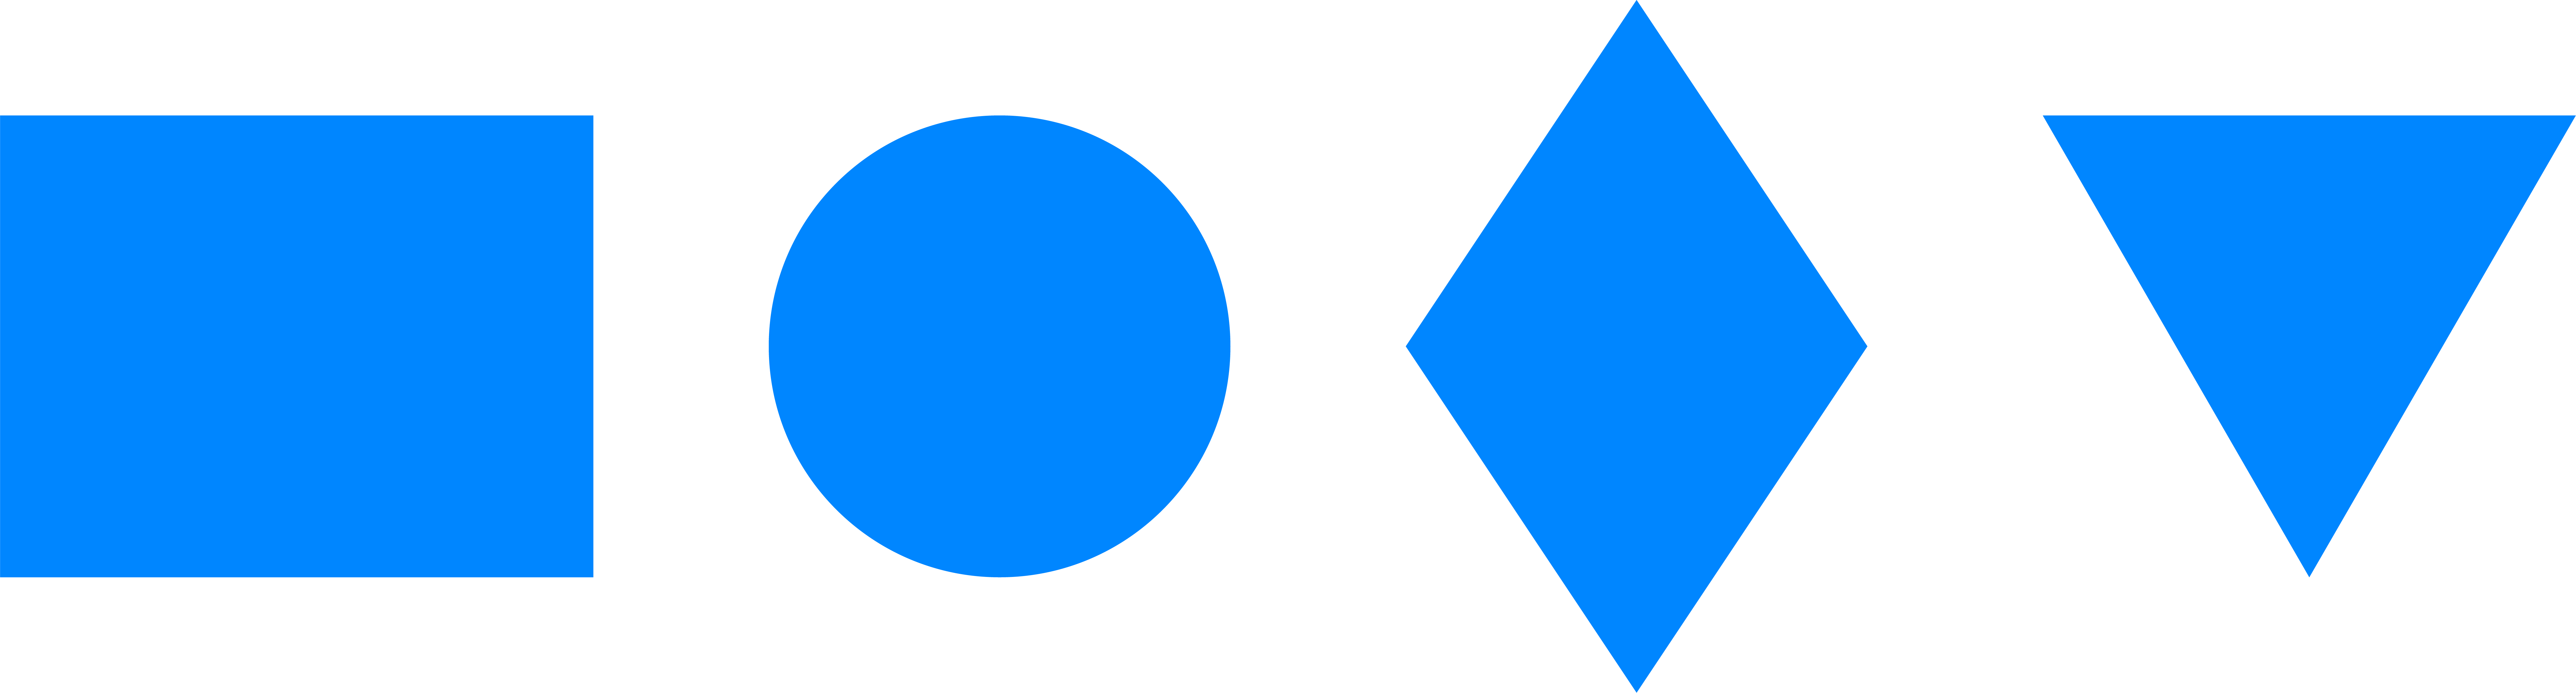 IMAX Shapes